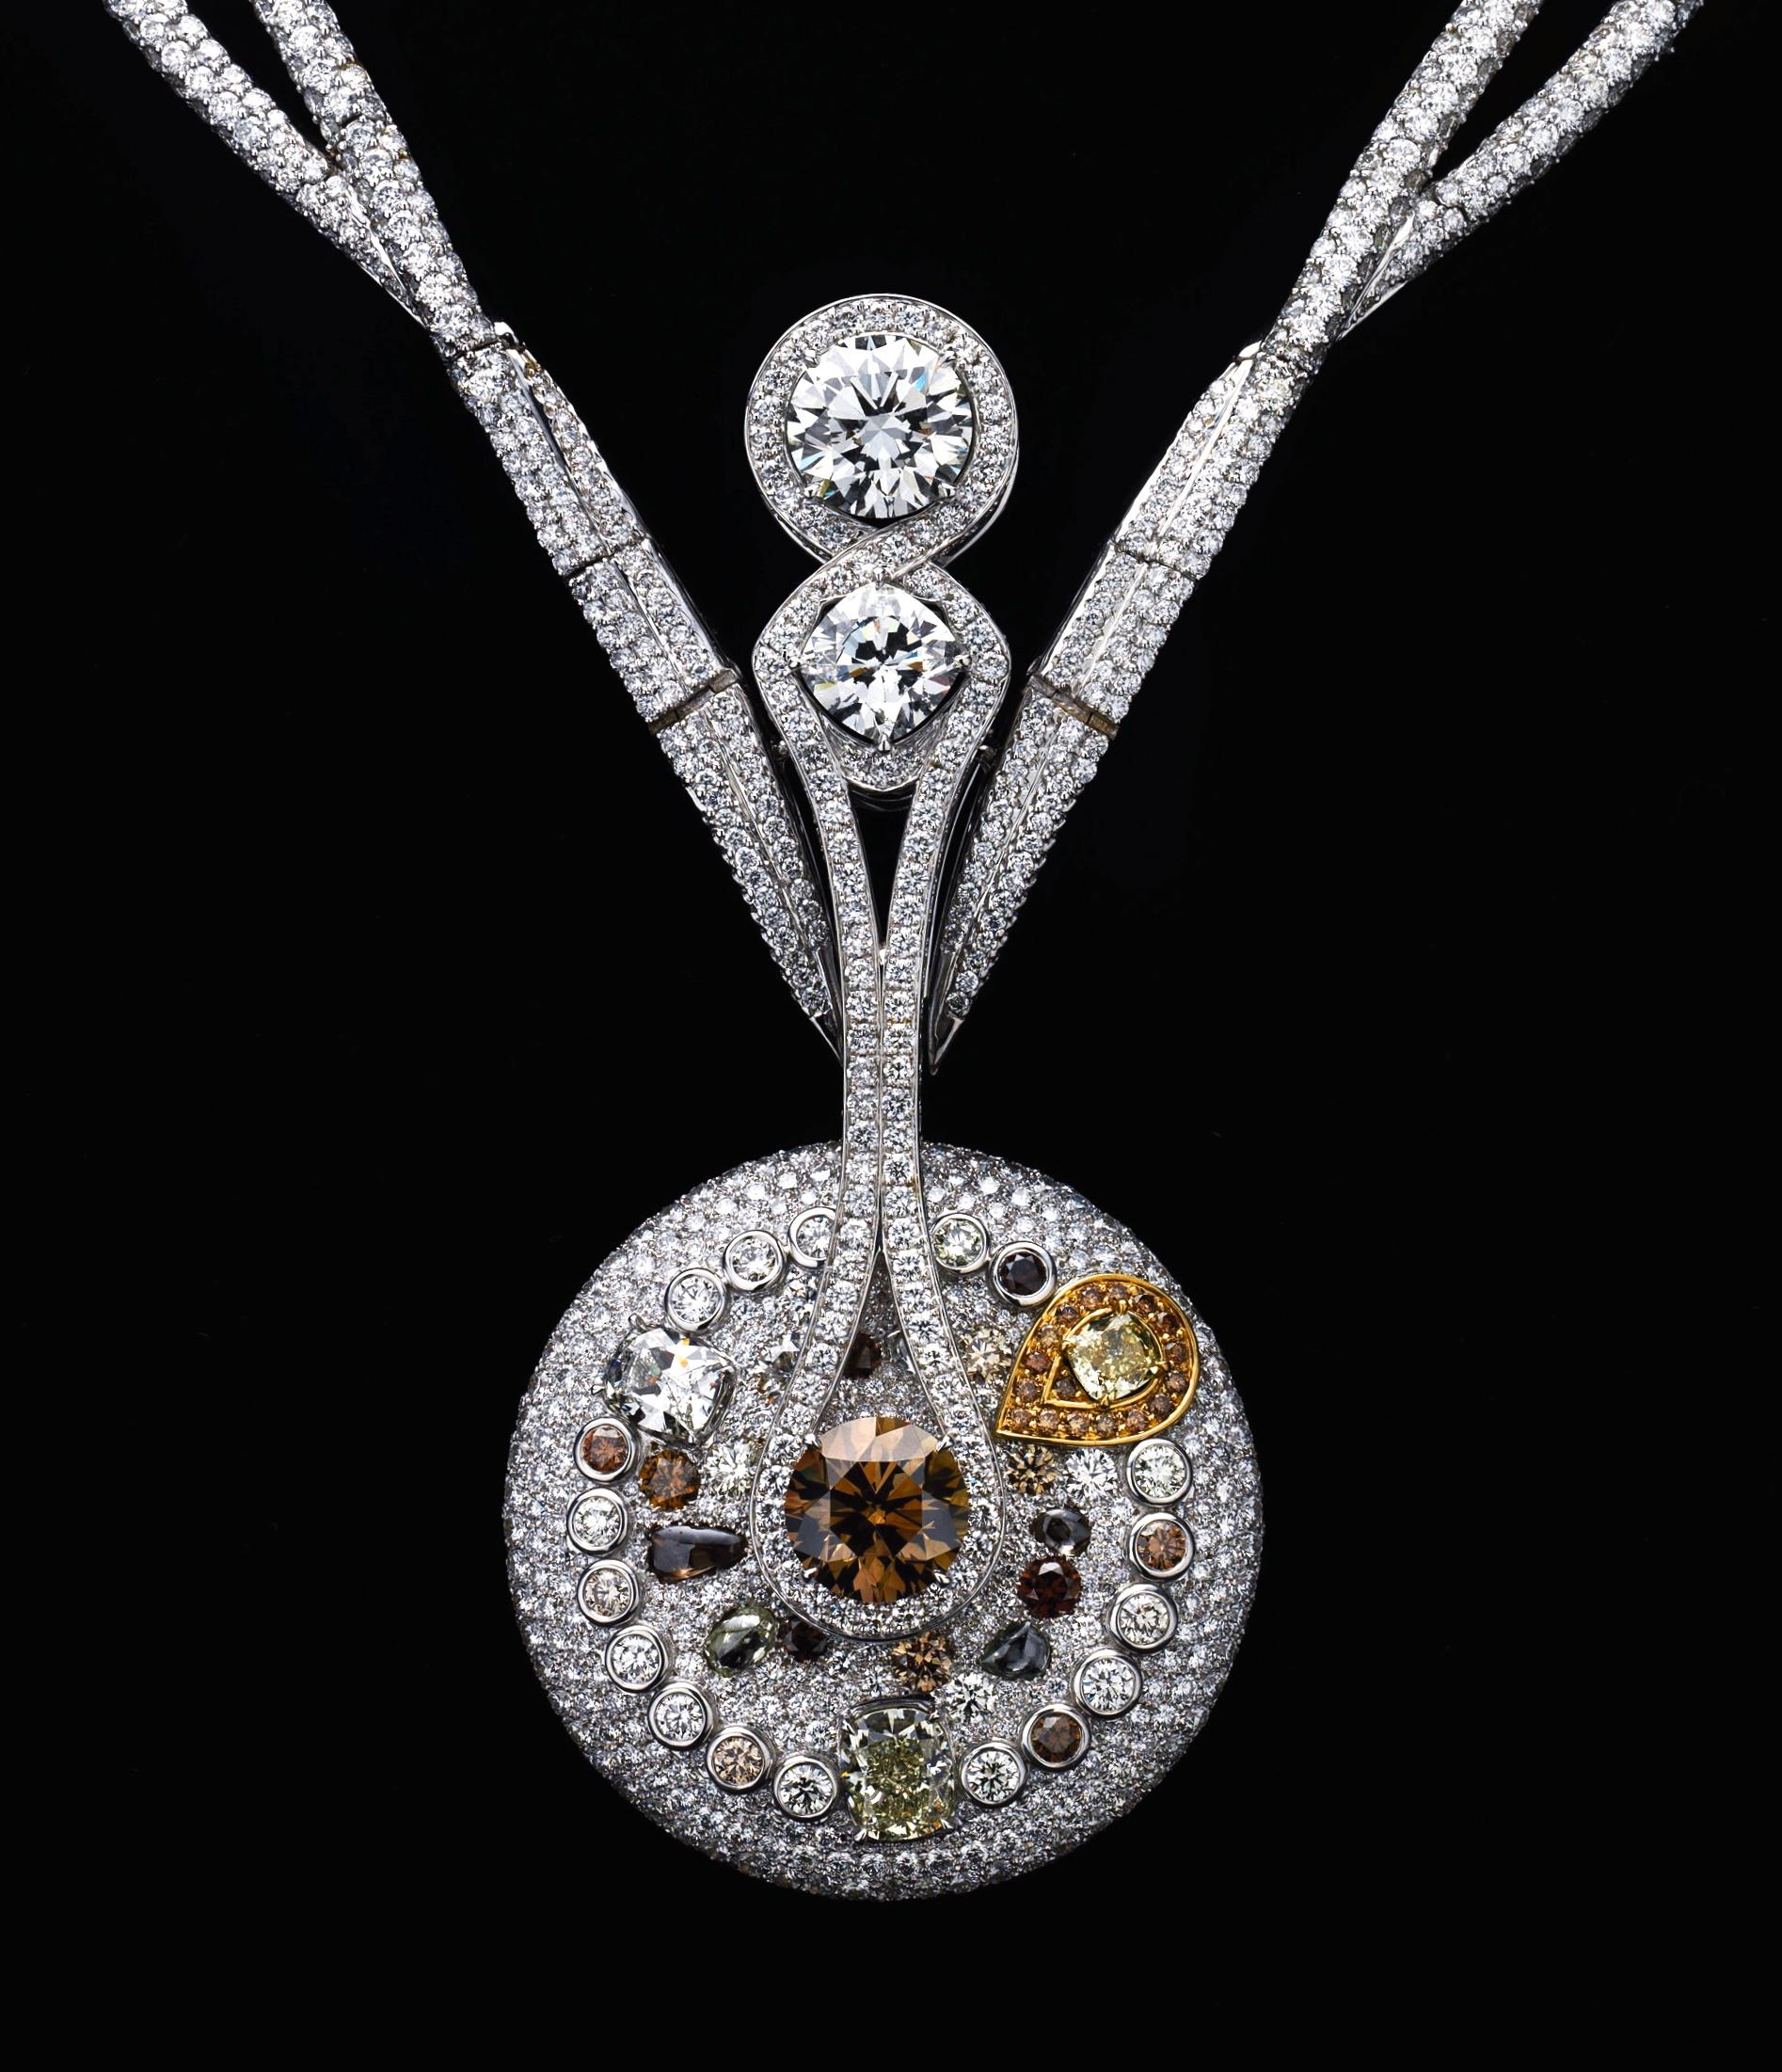 Rio Tinto Bunder Diamonds_Reena Ahluwalia Necklace1.jpg